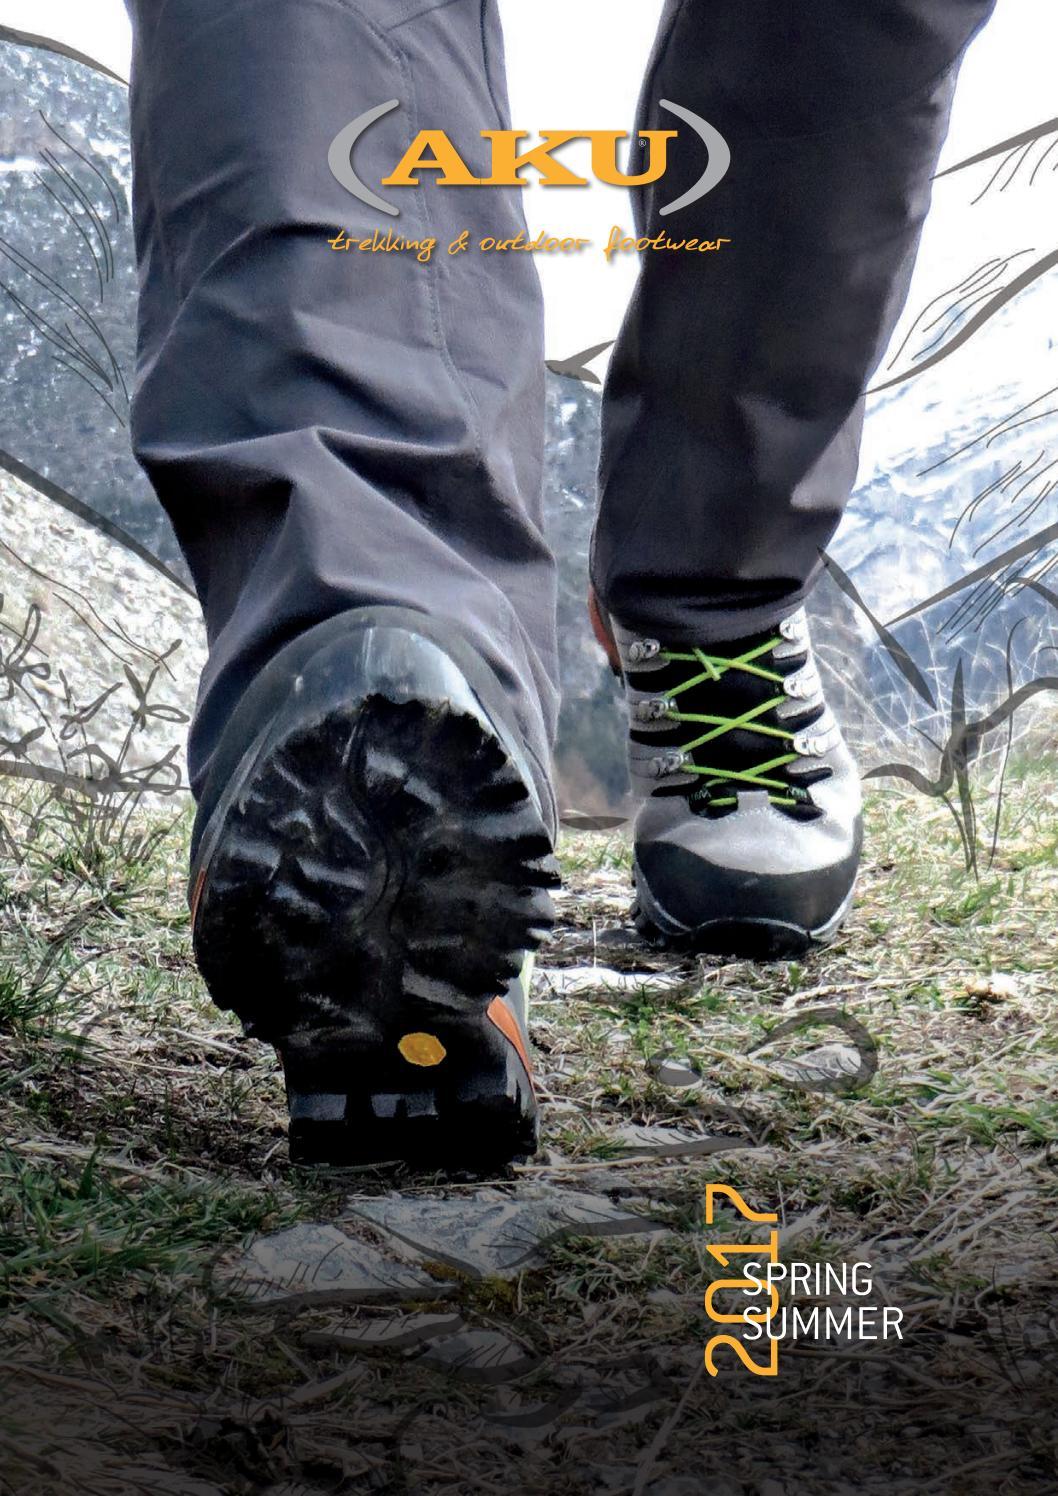 Ss17 De Aku Workbook By Eng Issuu Footwear amp;outdoor Trekking YWD2EHI9